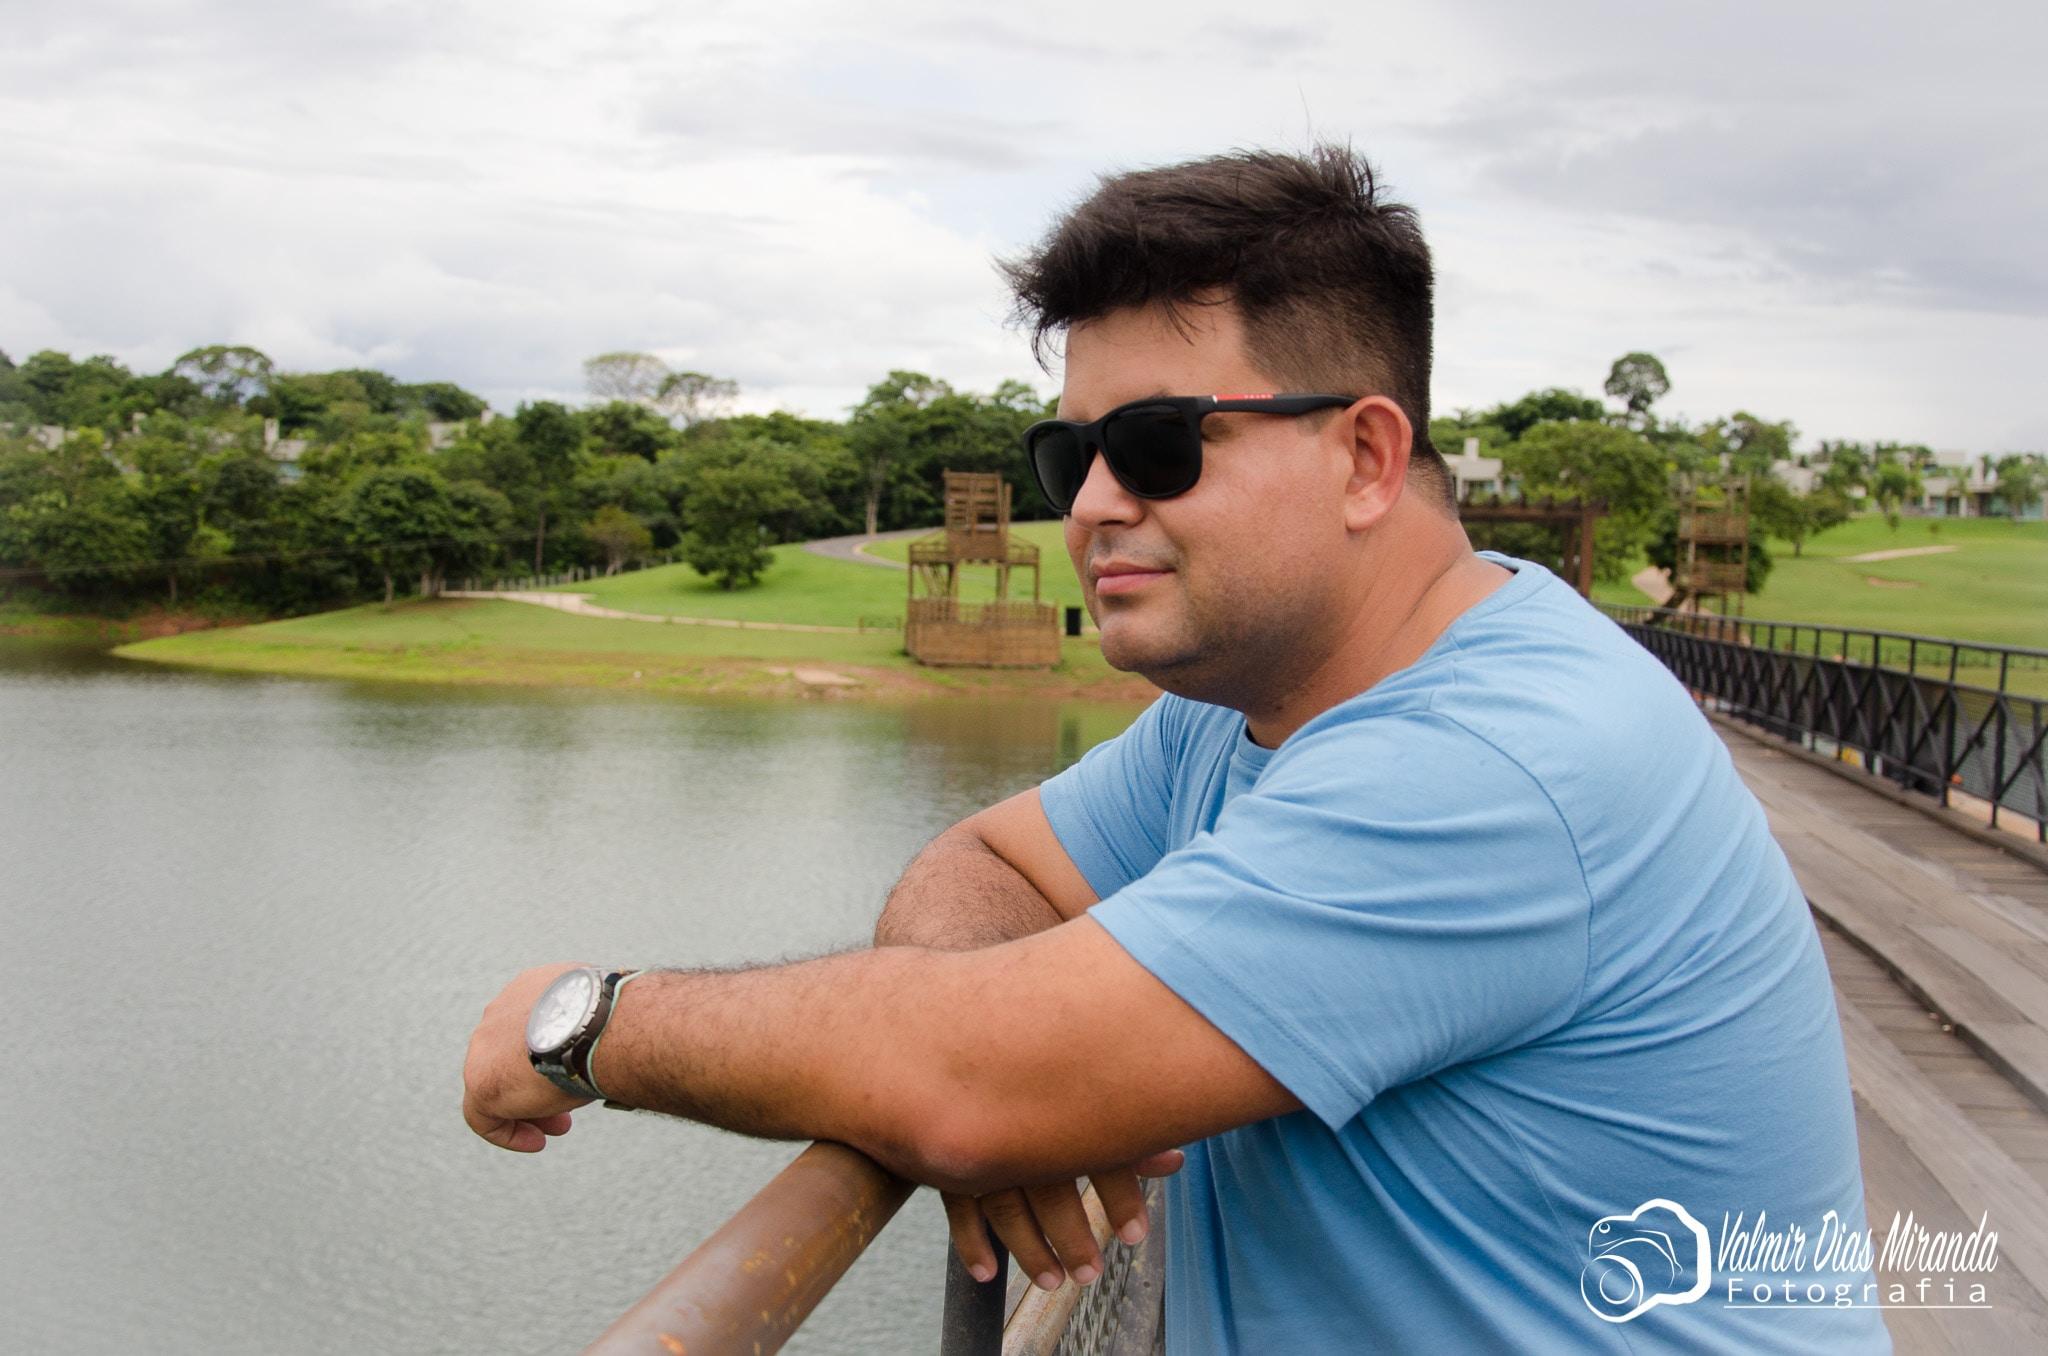 Go to valmir miranda's profile